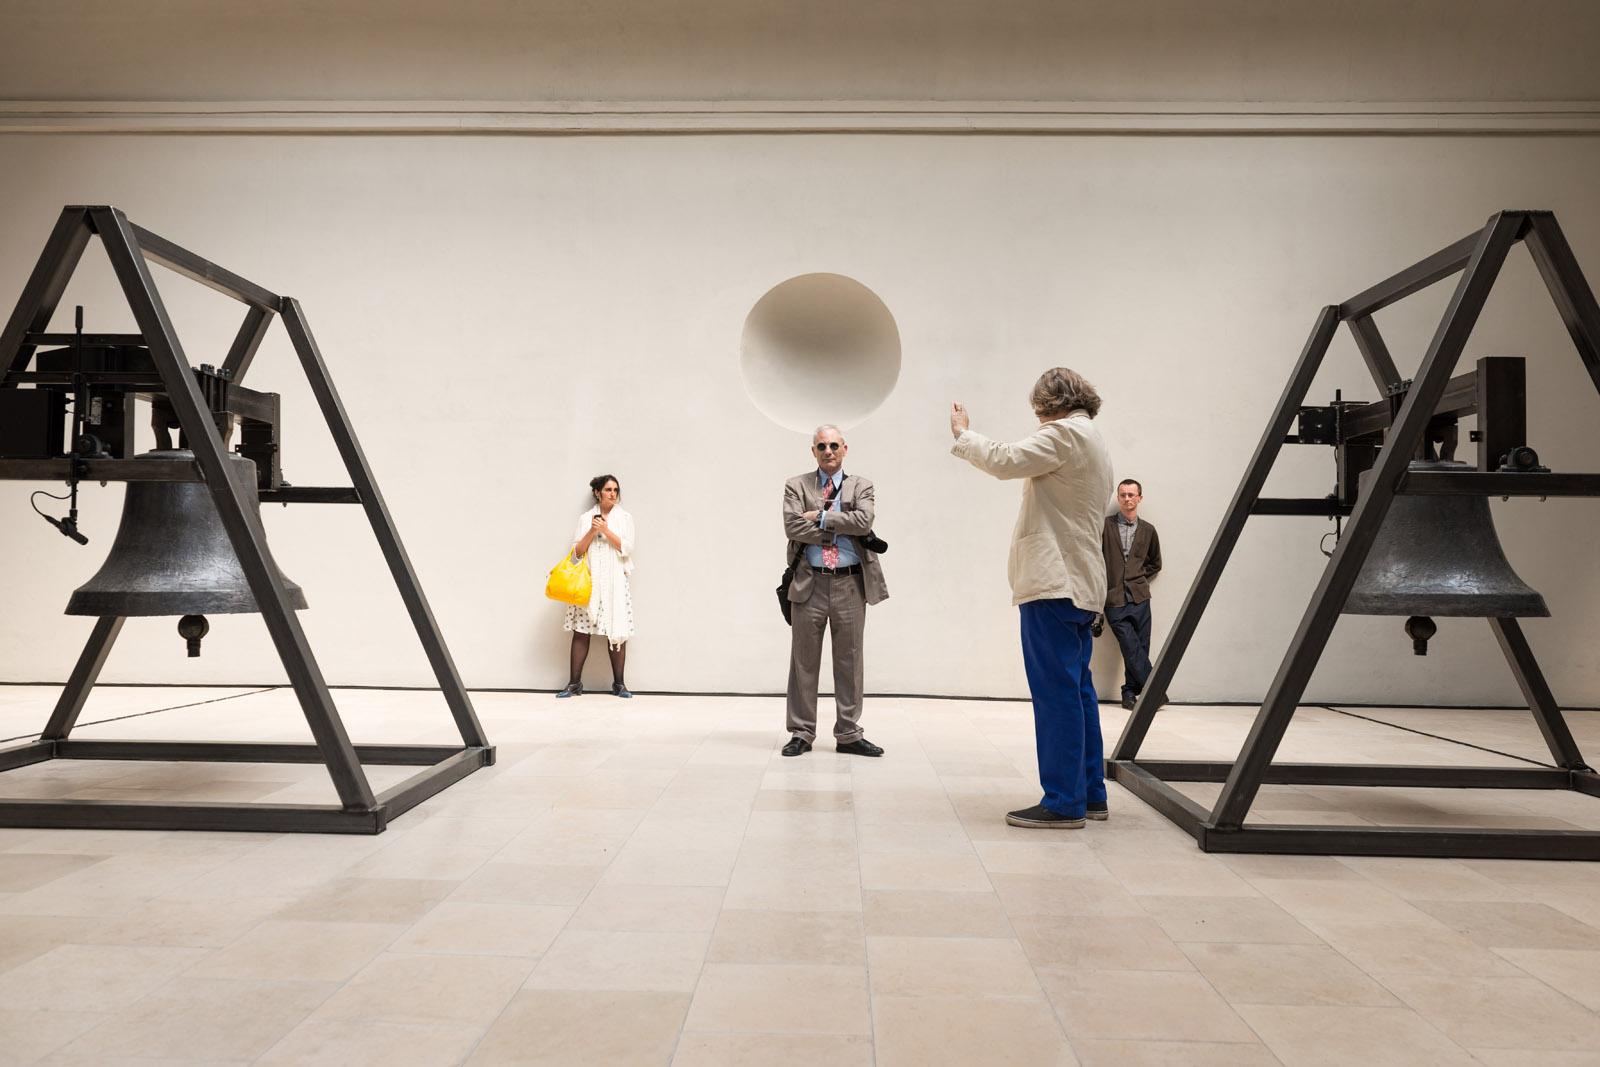 Konrad Smoleński Konrad Smoleński, Everything Was Forever, Until It Was No More, Pawilon Polski, 55te Biennale Sztuki wWenecji. Fot.Bartosz Górka, CC BY-SA